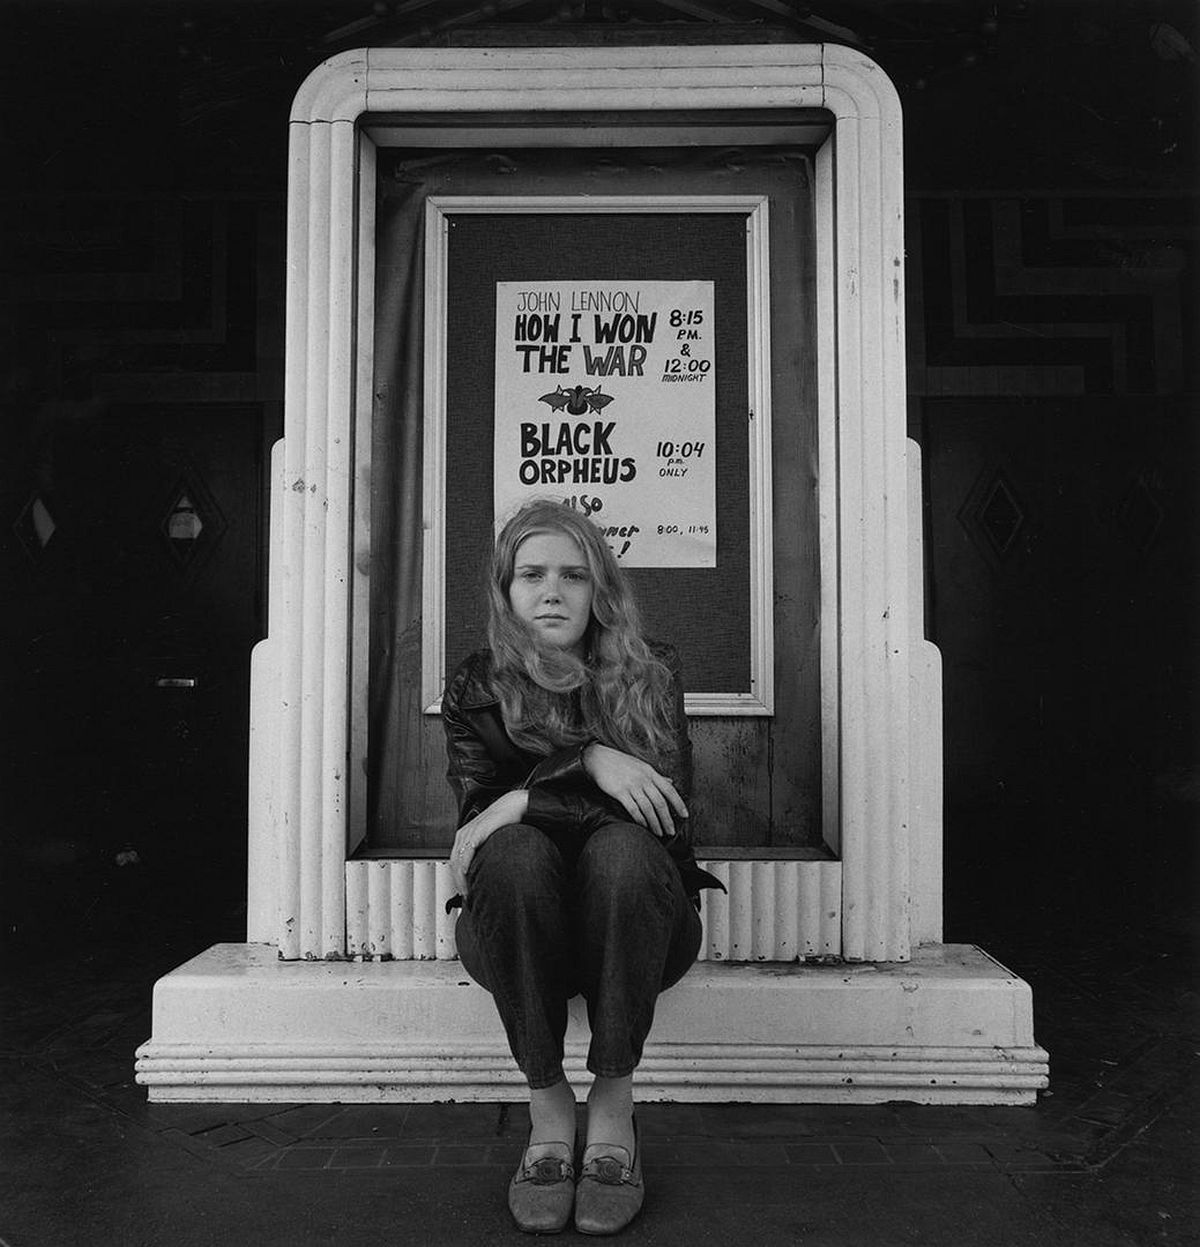 Linda, Haight Ashbury 1968